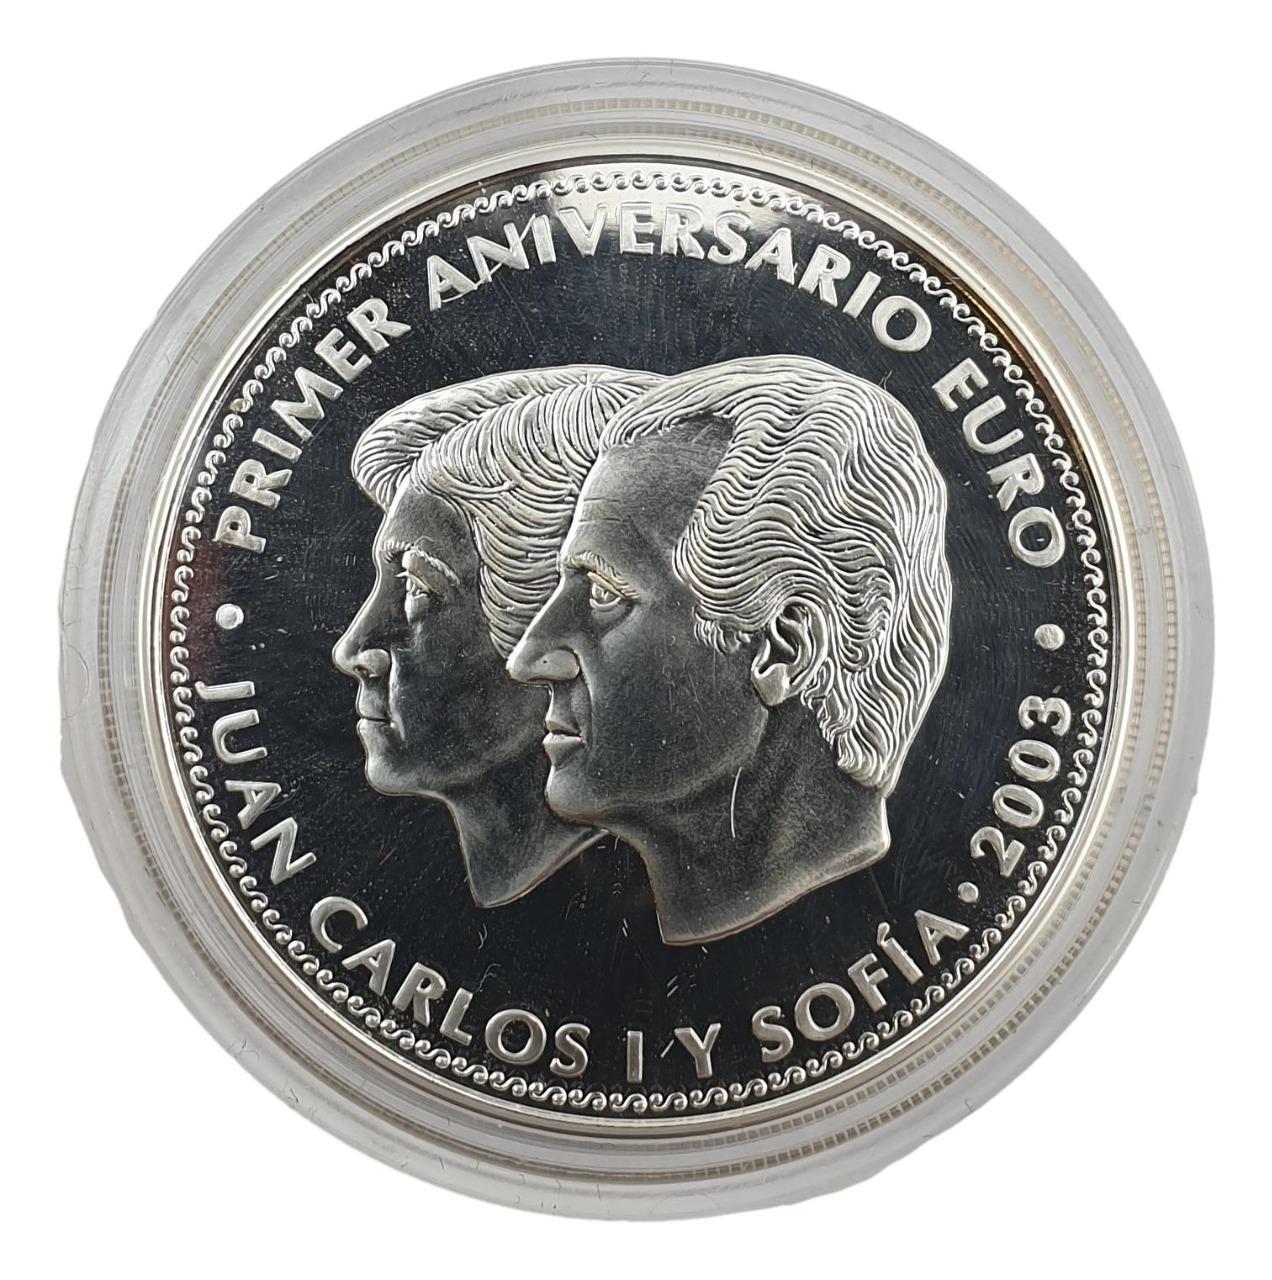 Spain - 10 Euro 2003, Juan Carlos I, UNC